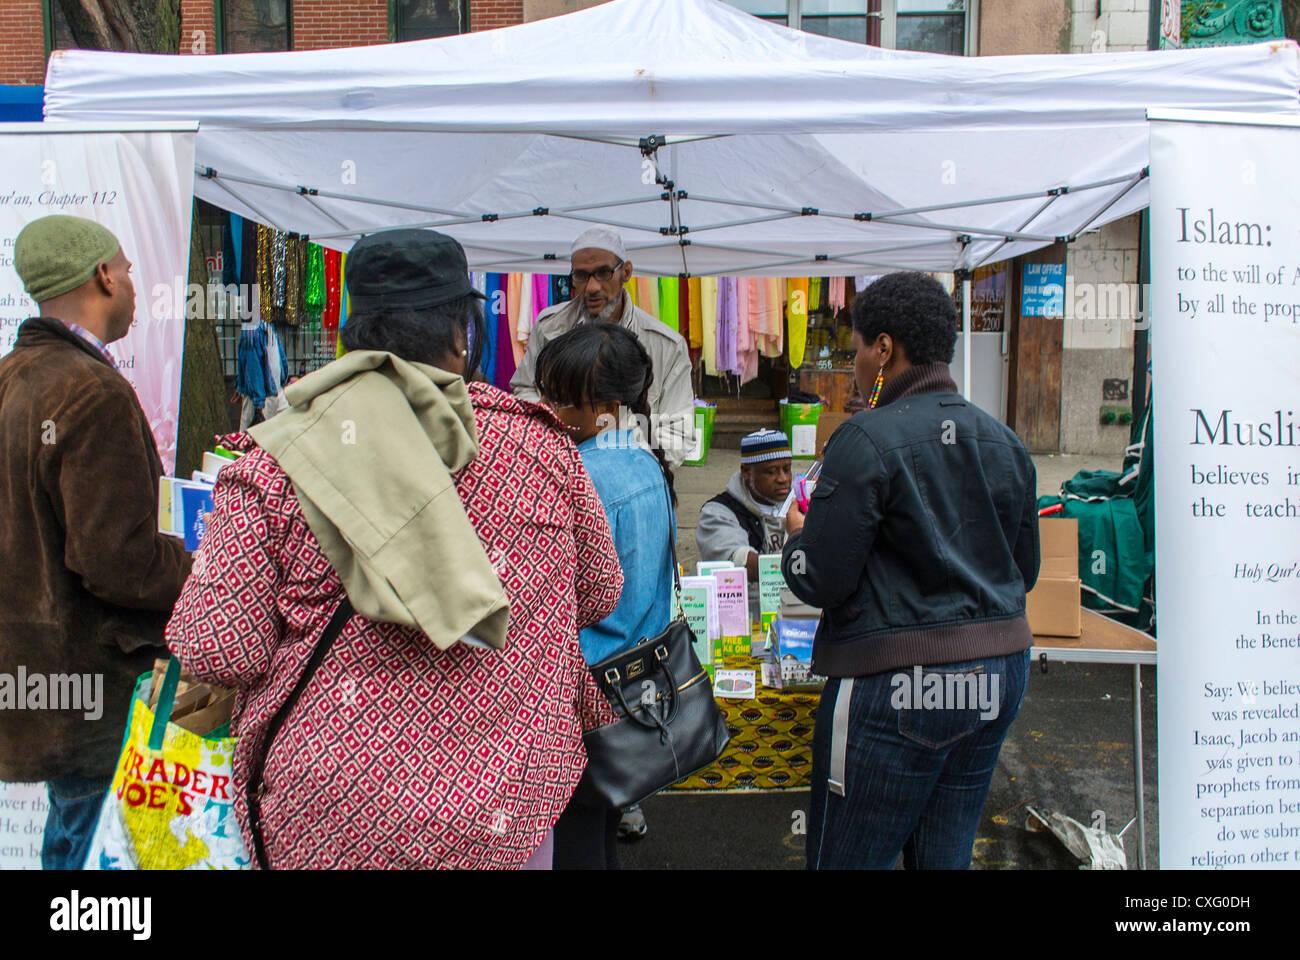 New York City, USA, American Muslims Stall the Brooklyn Street Festival, 'Atlantic Antic', Flea Market, - Stock Image